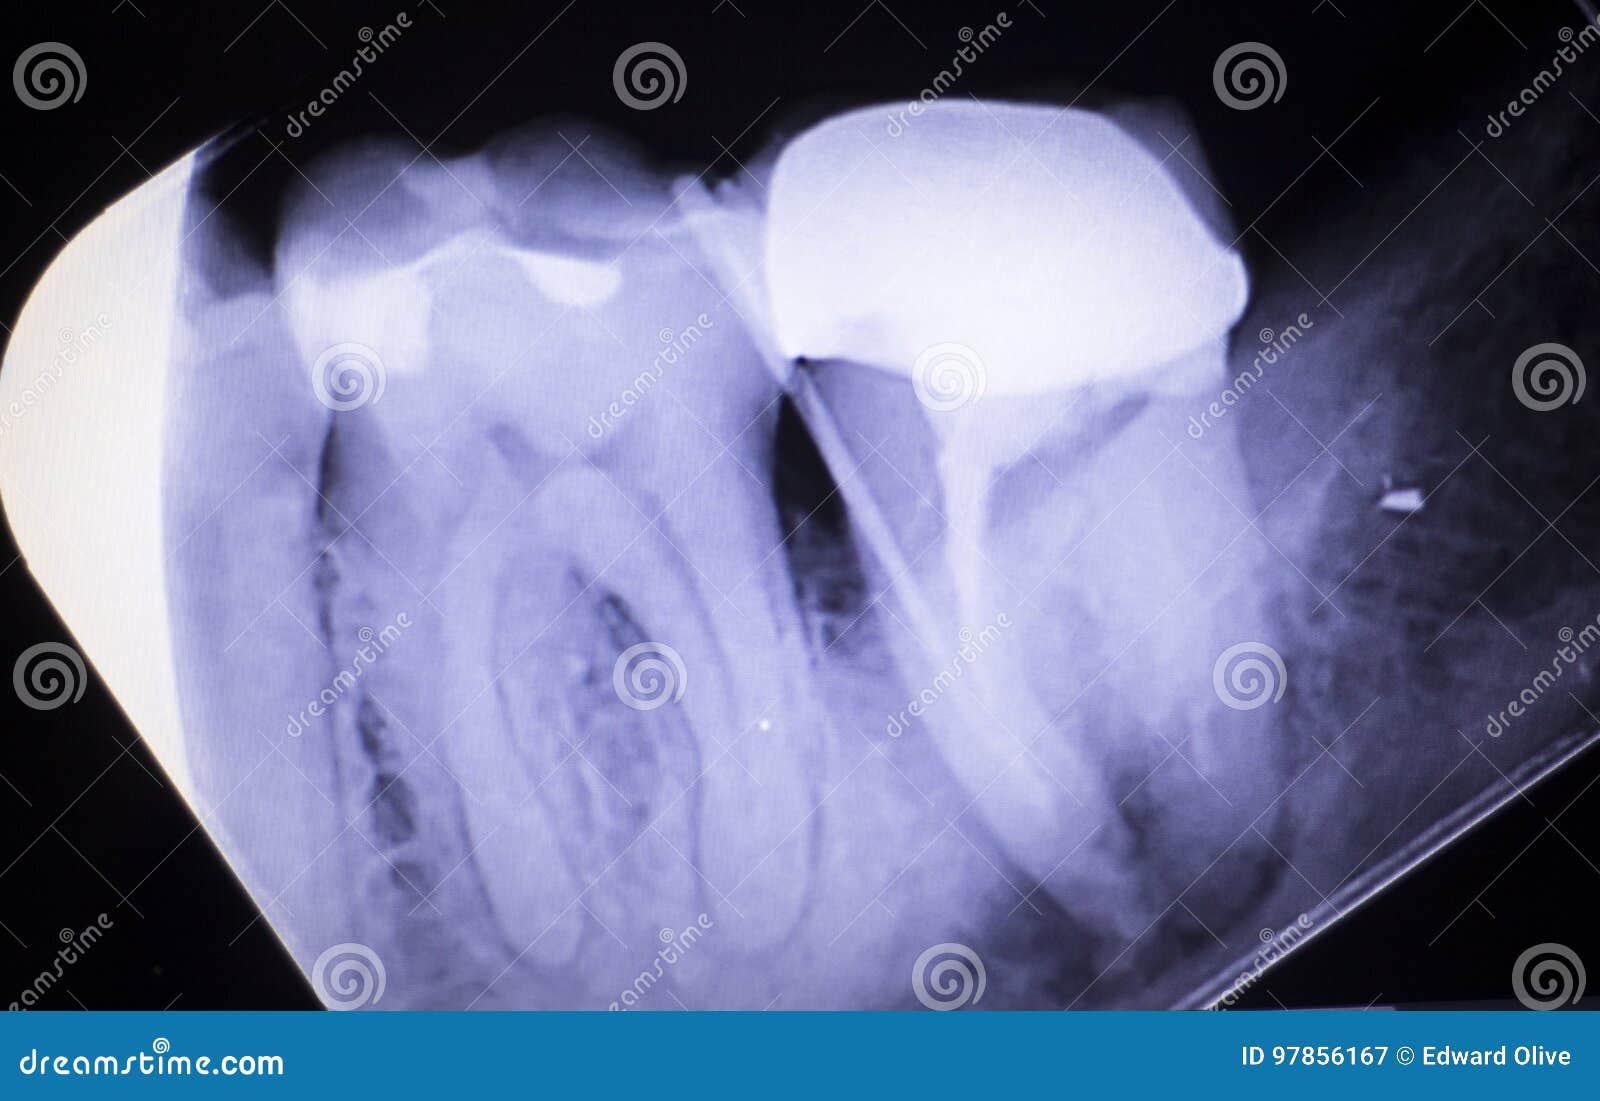 molar tooth abscess - HD1300×911